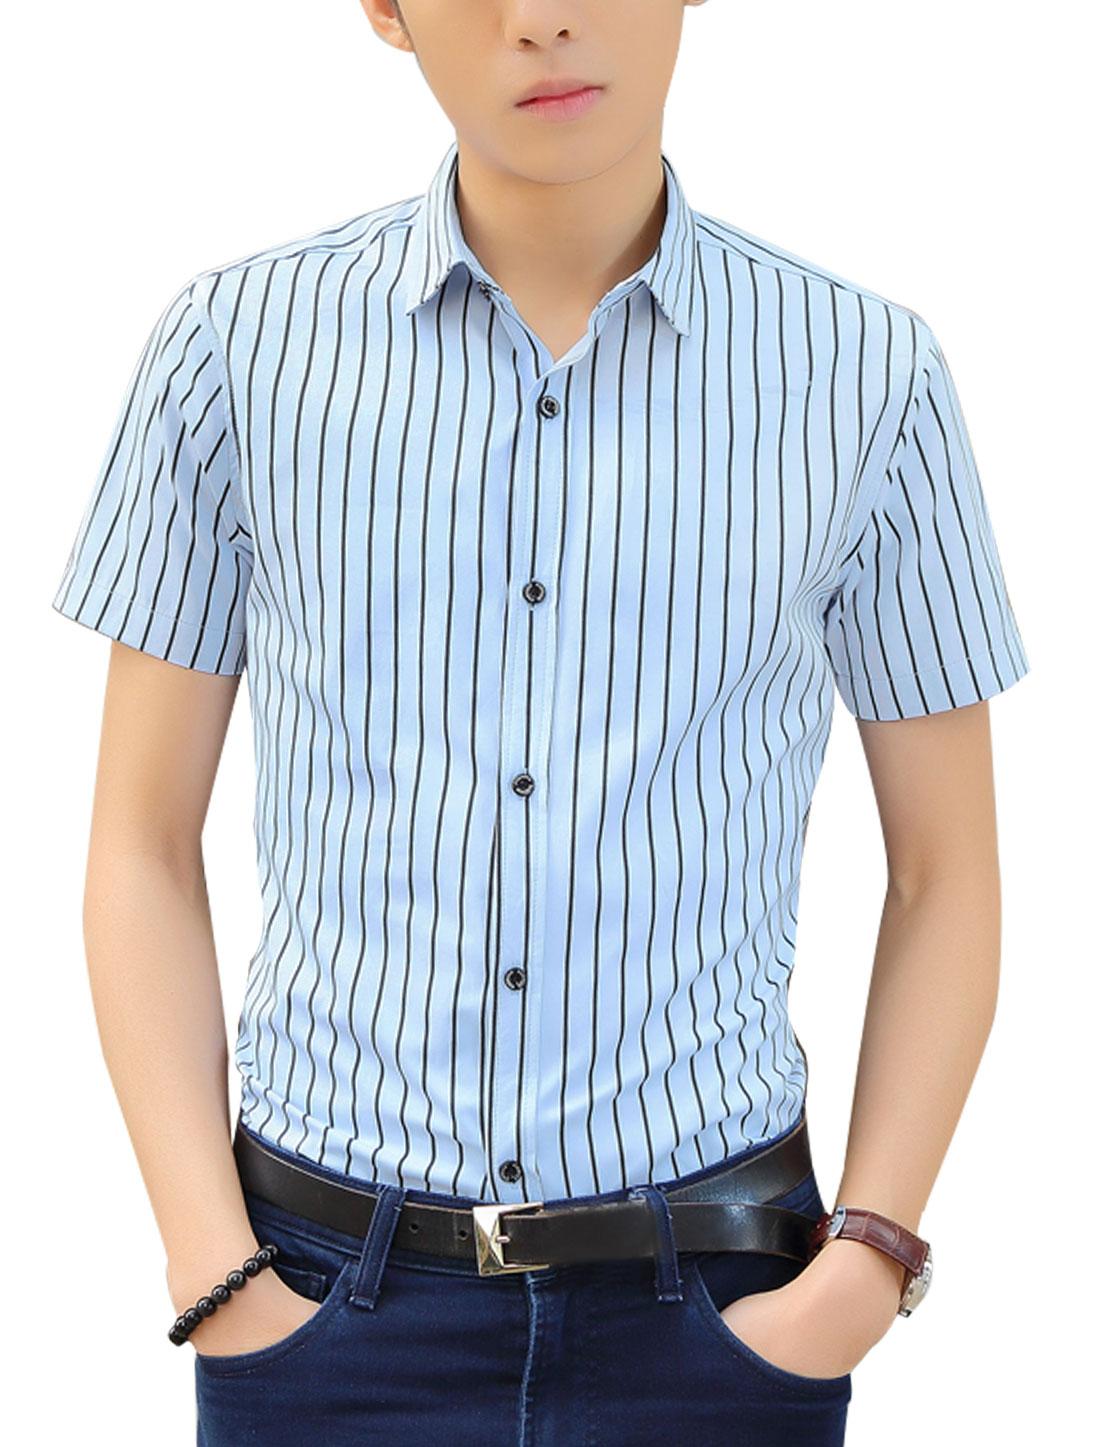 Men Short Sleeves Bar Striped Shirts Black Light Blue M